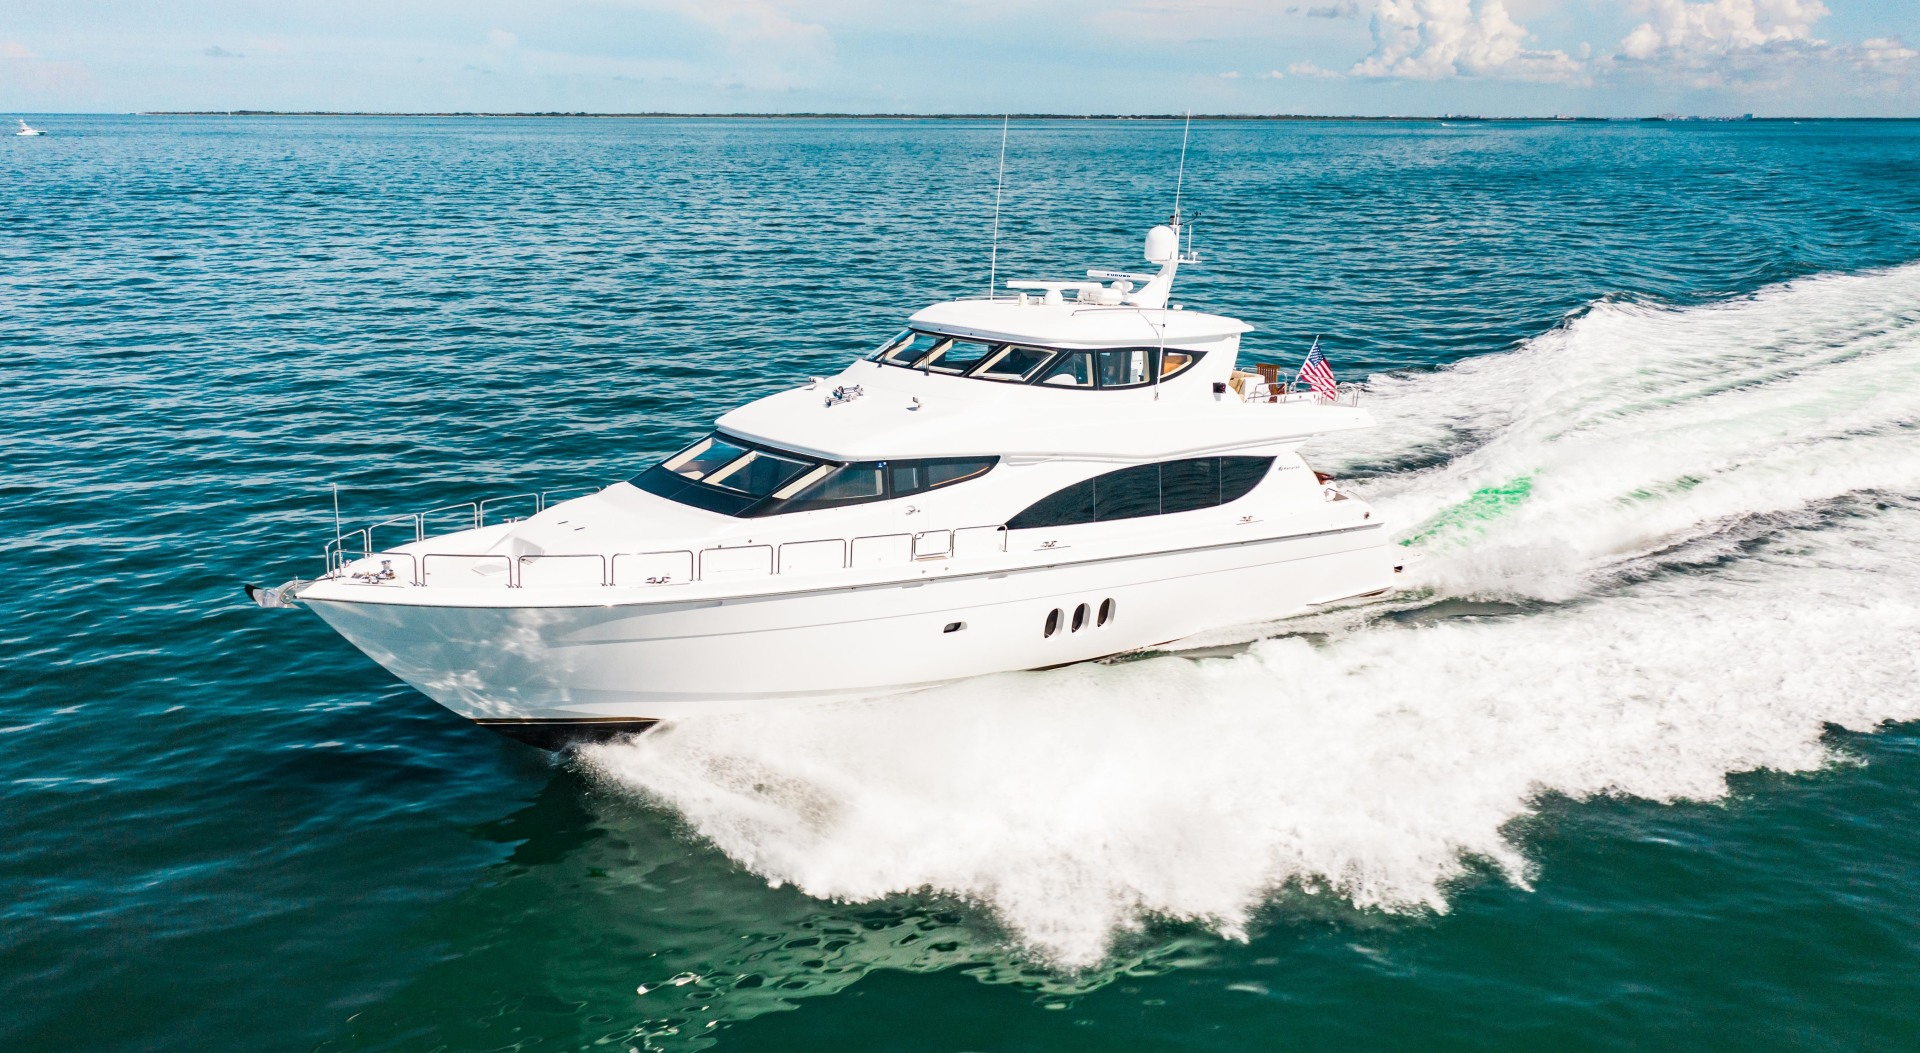 Hatteras-80 Motor Yacht 2008-Galati Yacht Sales Trade Anna Maria-Florida-United States-2008 Hatteras 80 Motor Yacht  Galati Yacht Sales Trade-1466284 | Thumbnail